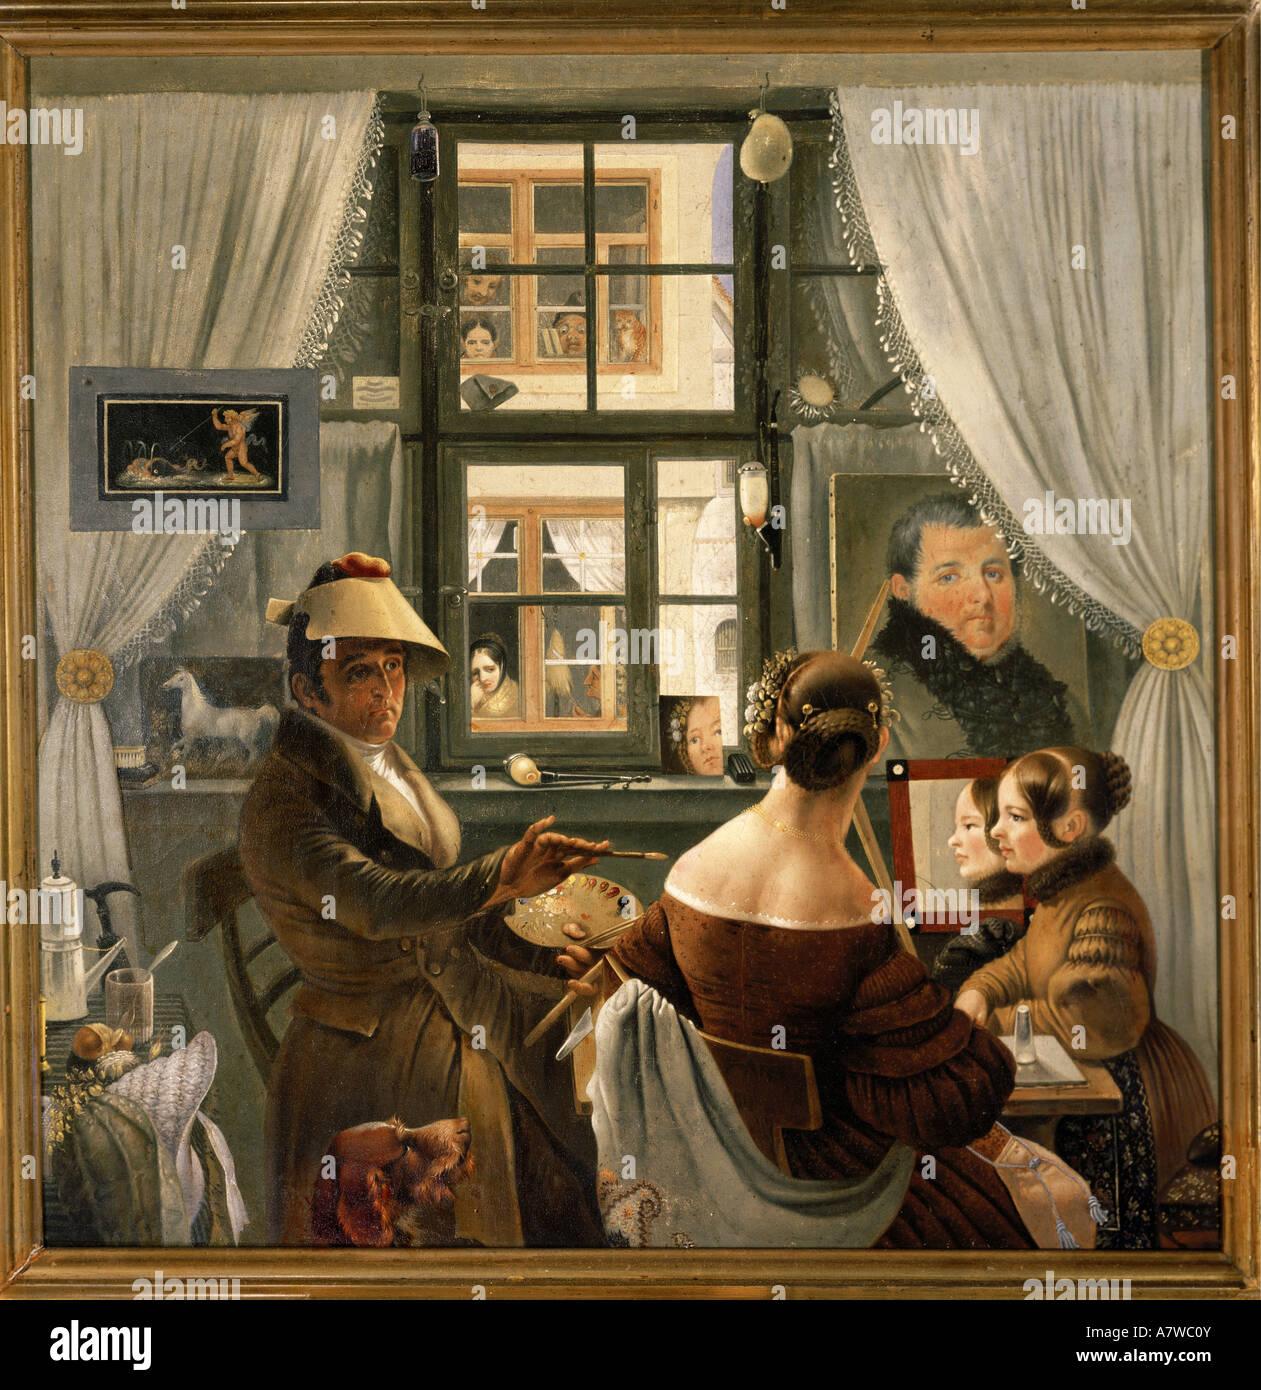 "Bellas artes, Göser, Karl Friedrich (1803 - 1858), pintura, ""im elbstbildnis Atelier' ('Selfportrait Imagen De Stock"